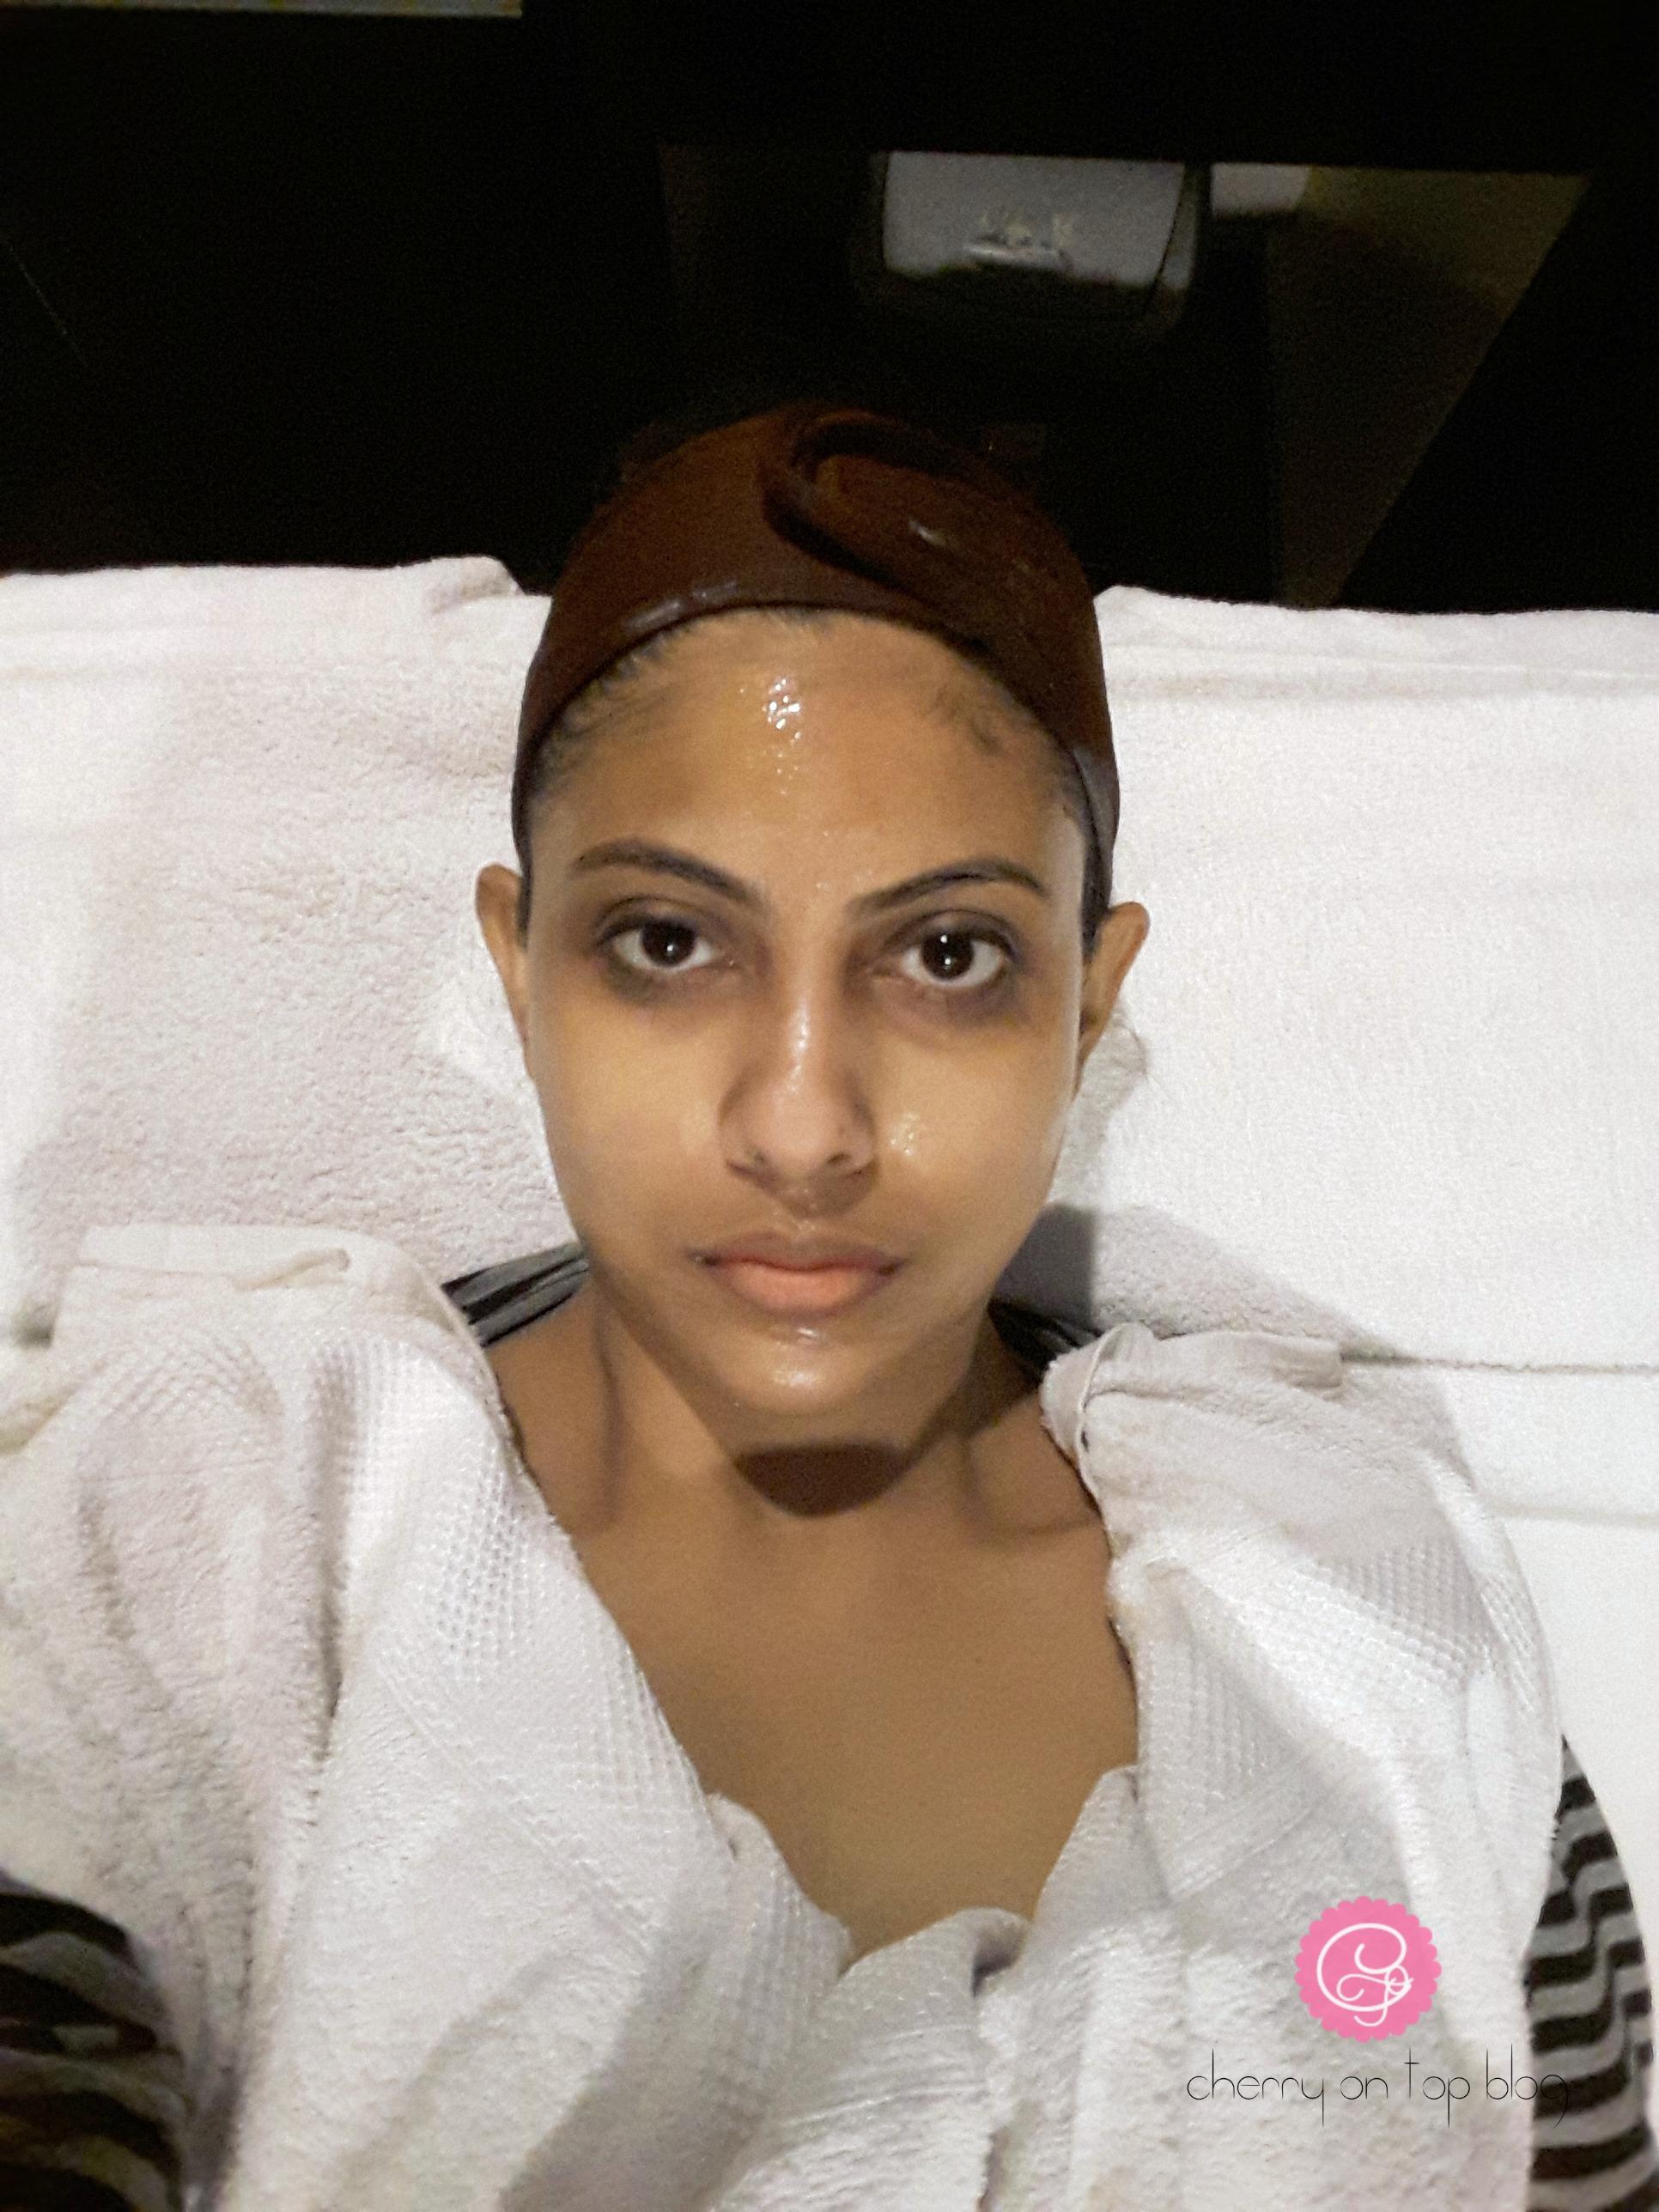 Club Salon Shine & Glow Facial Review| cherryontopblog.com